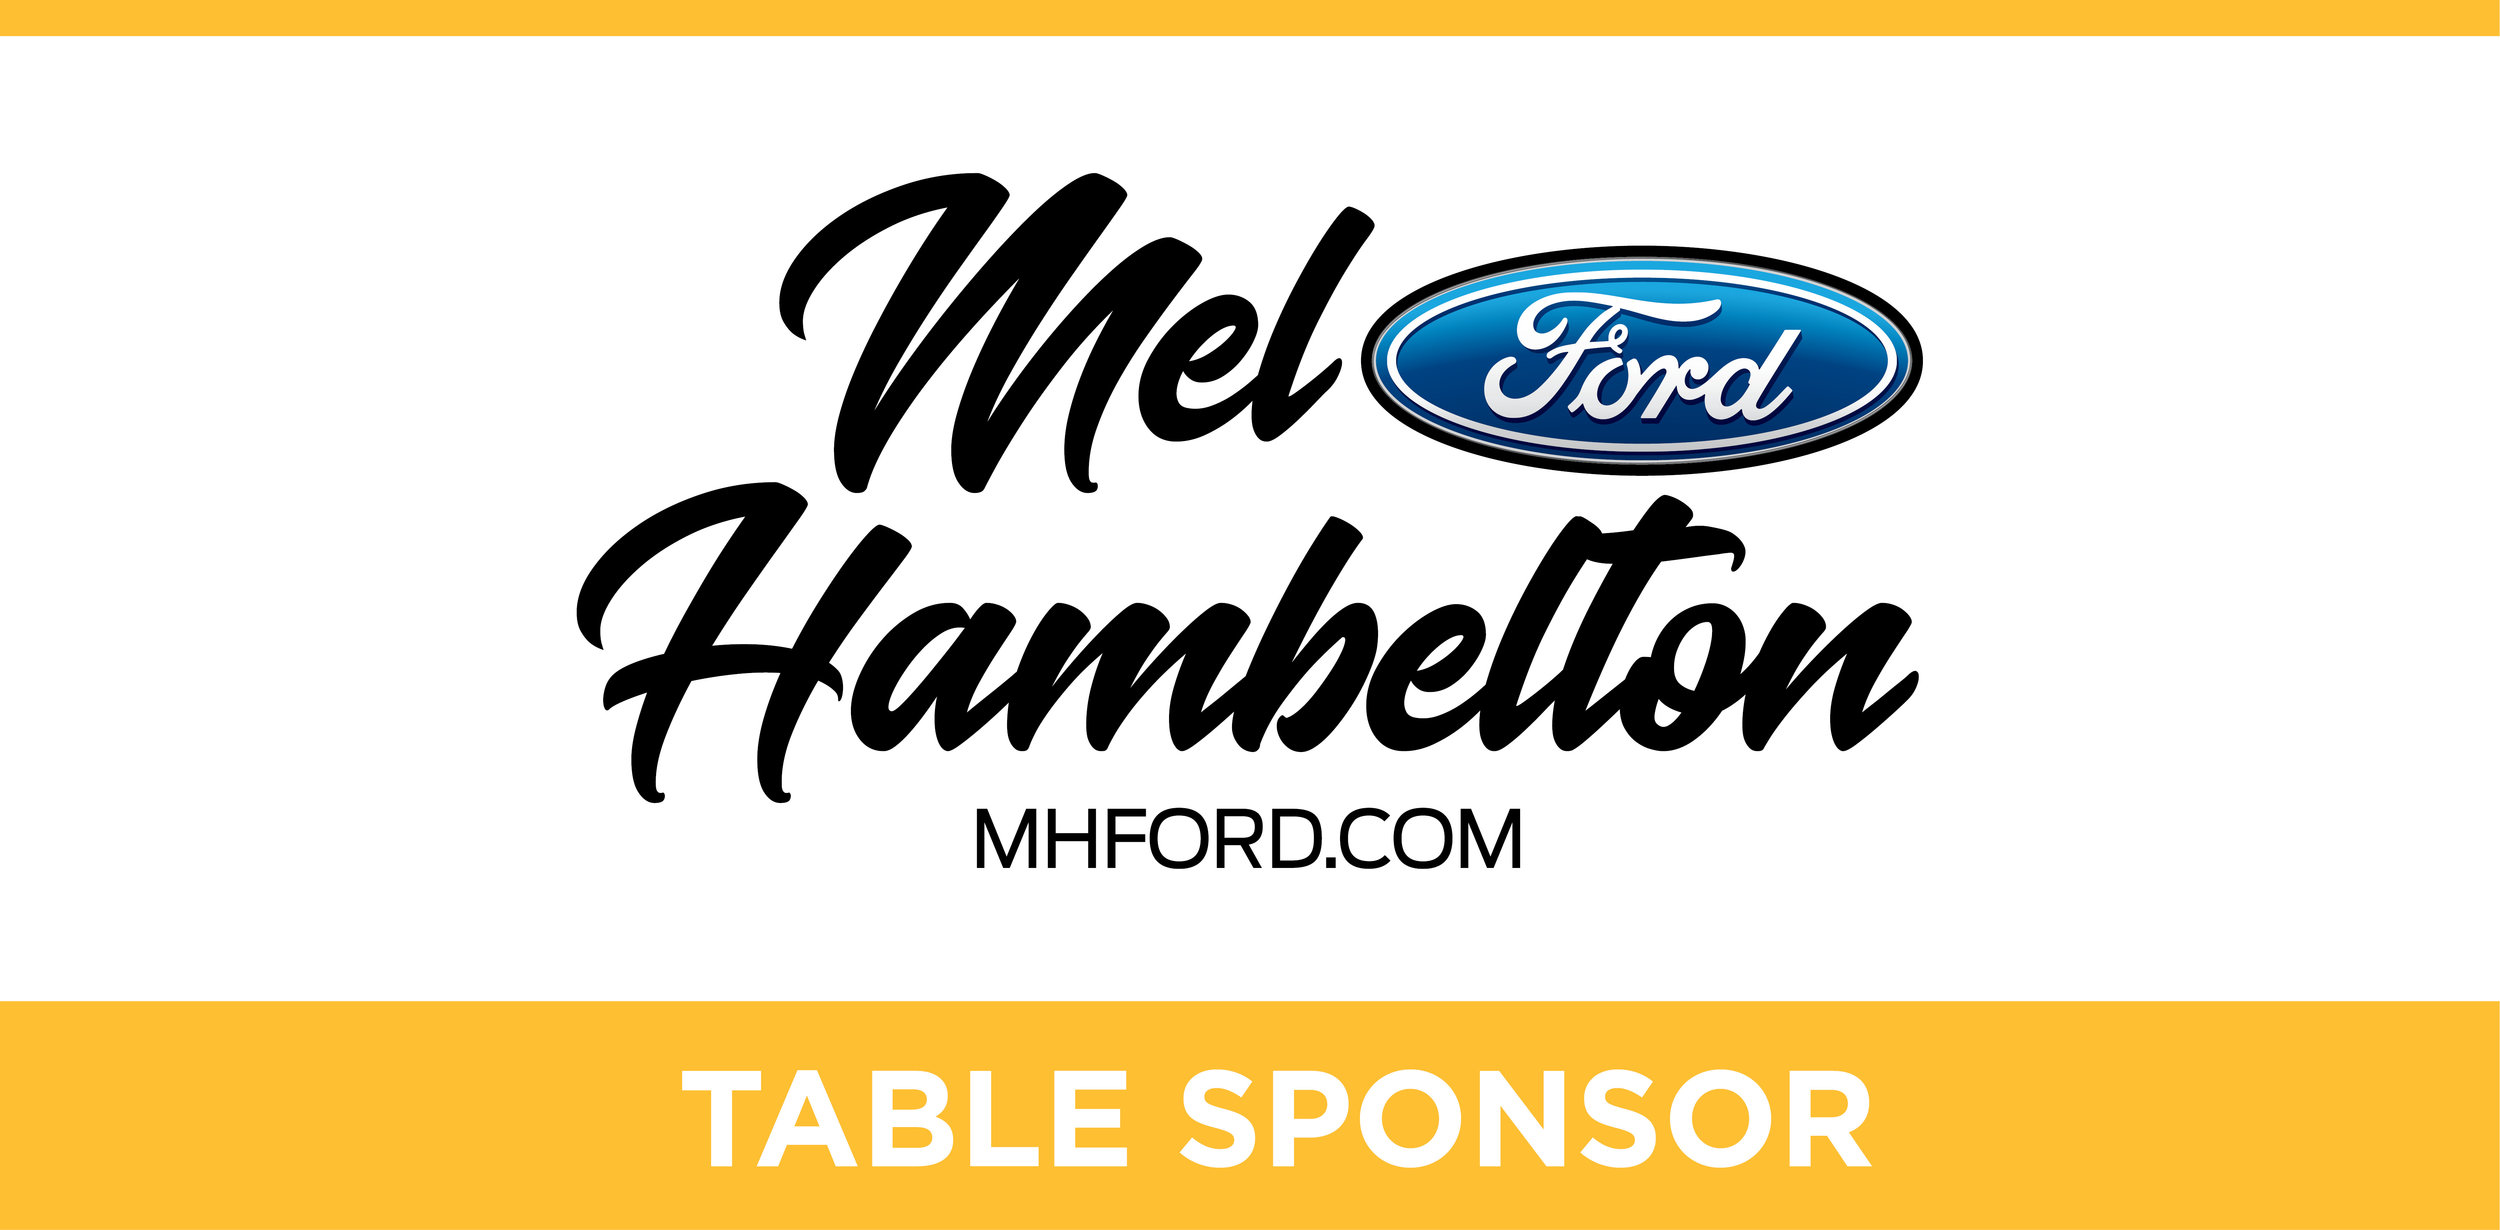 Mel Hambelton SBF19 Web Sponsor Sign.jpg